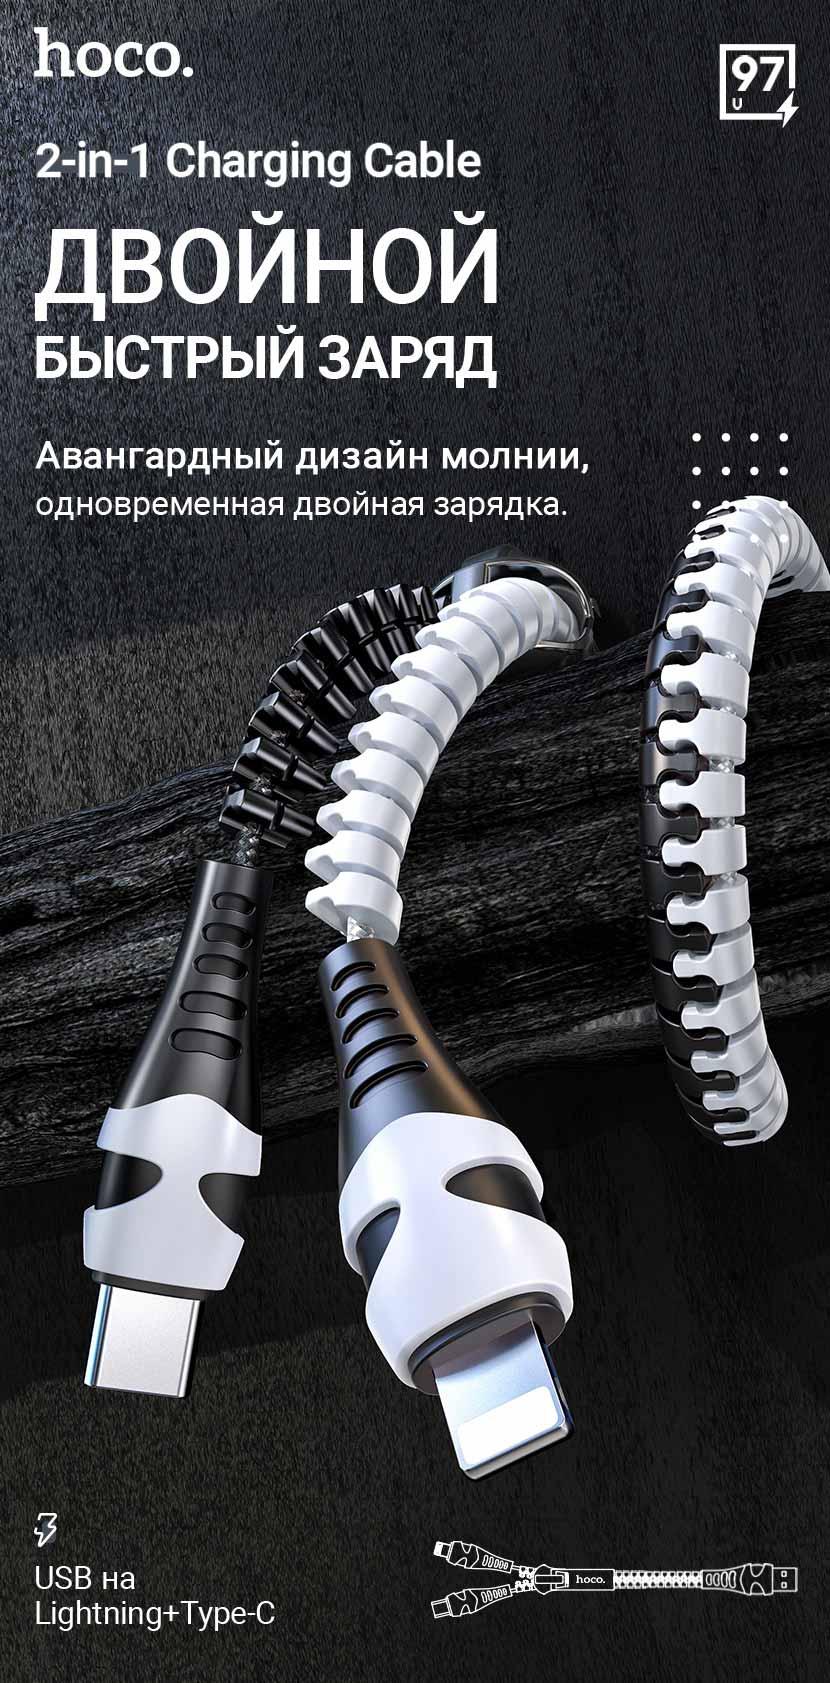 hoco news u97 2in1 zipper charging cable lightning type c ru